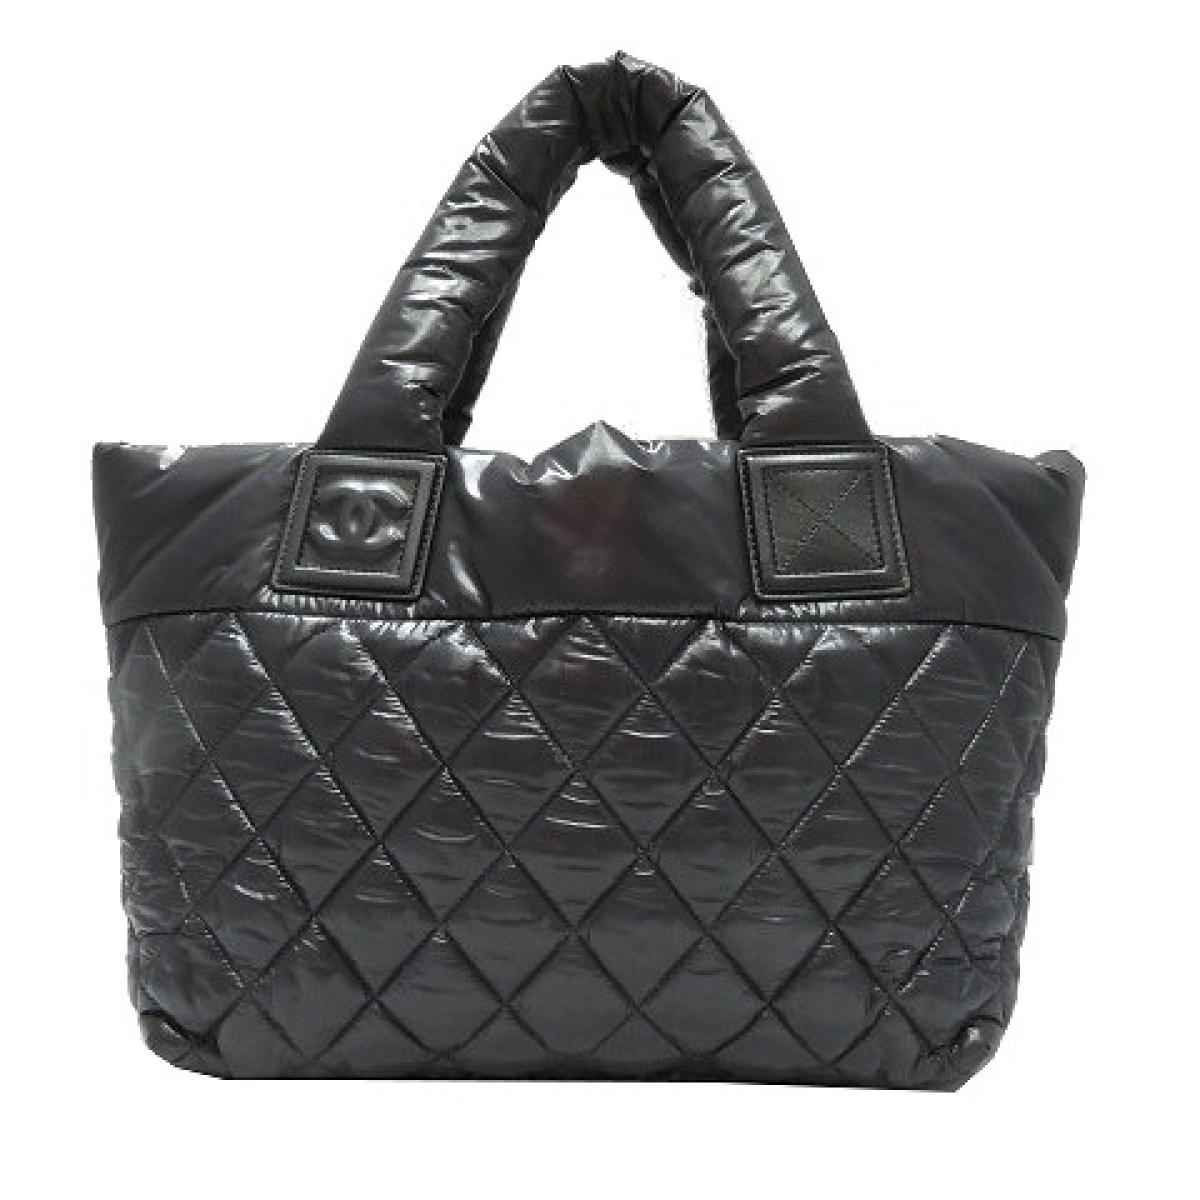 34c5ef2656bc Chanel here cocoon tote bag bag lady vinyl black (A48610) | CHANEL BRANDOFF  brand off-brand brand bag back tote bag tote bag Thoth